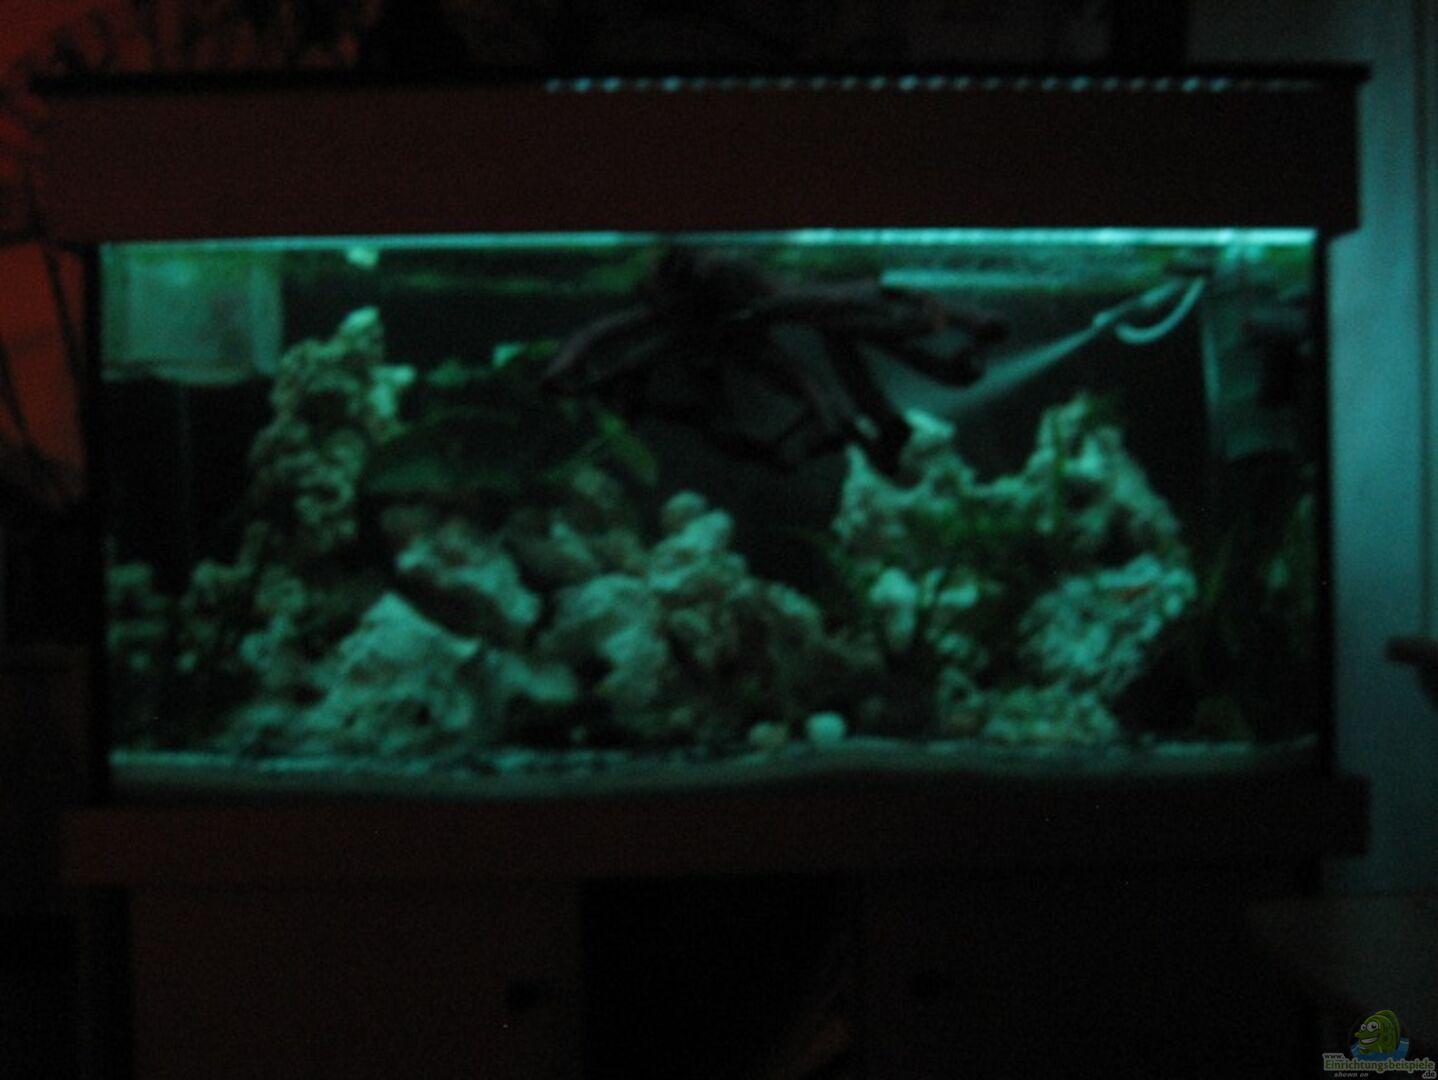 aquarium von sky1706 18168 malawieaquarium 430 liter. Black Bedroom Furniture Sets. Home Design Ideas